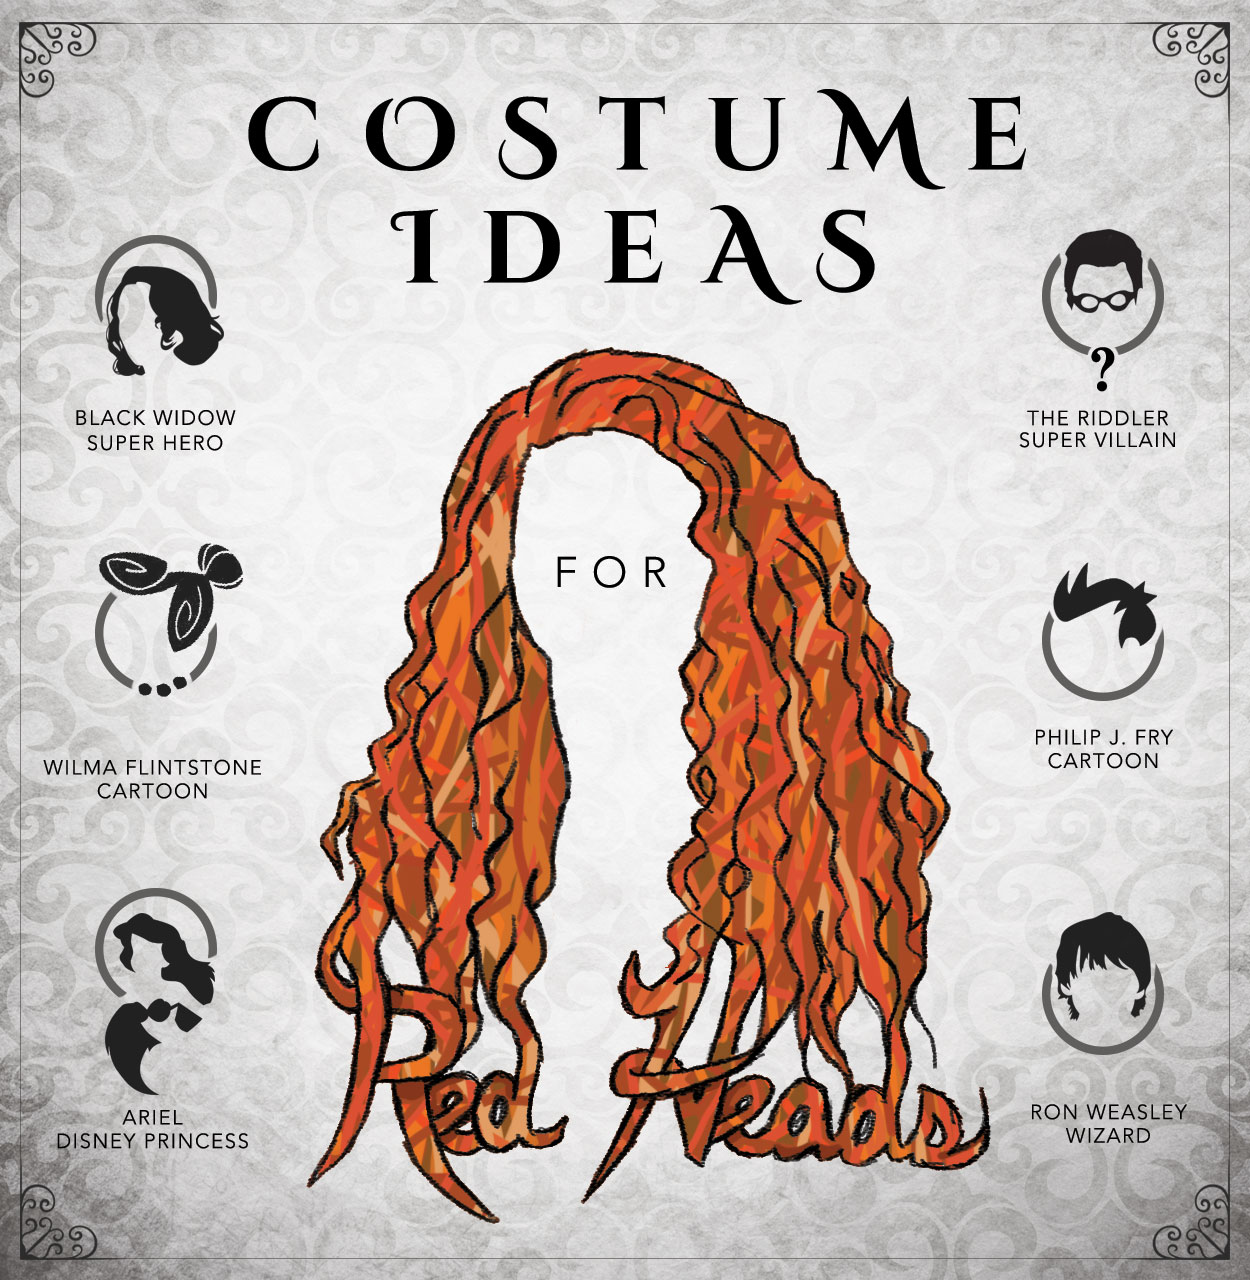 https://images.halloweencostumes.com/blog/939/halloween-costumes-for-redheads.jpg